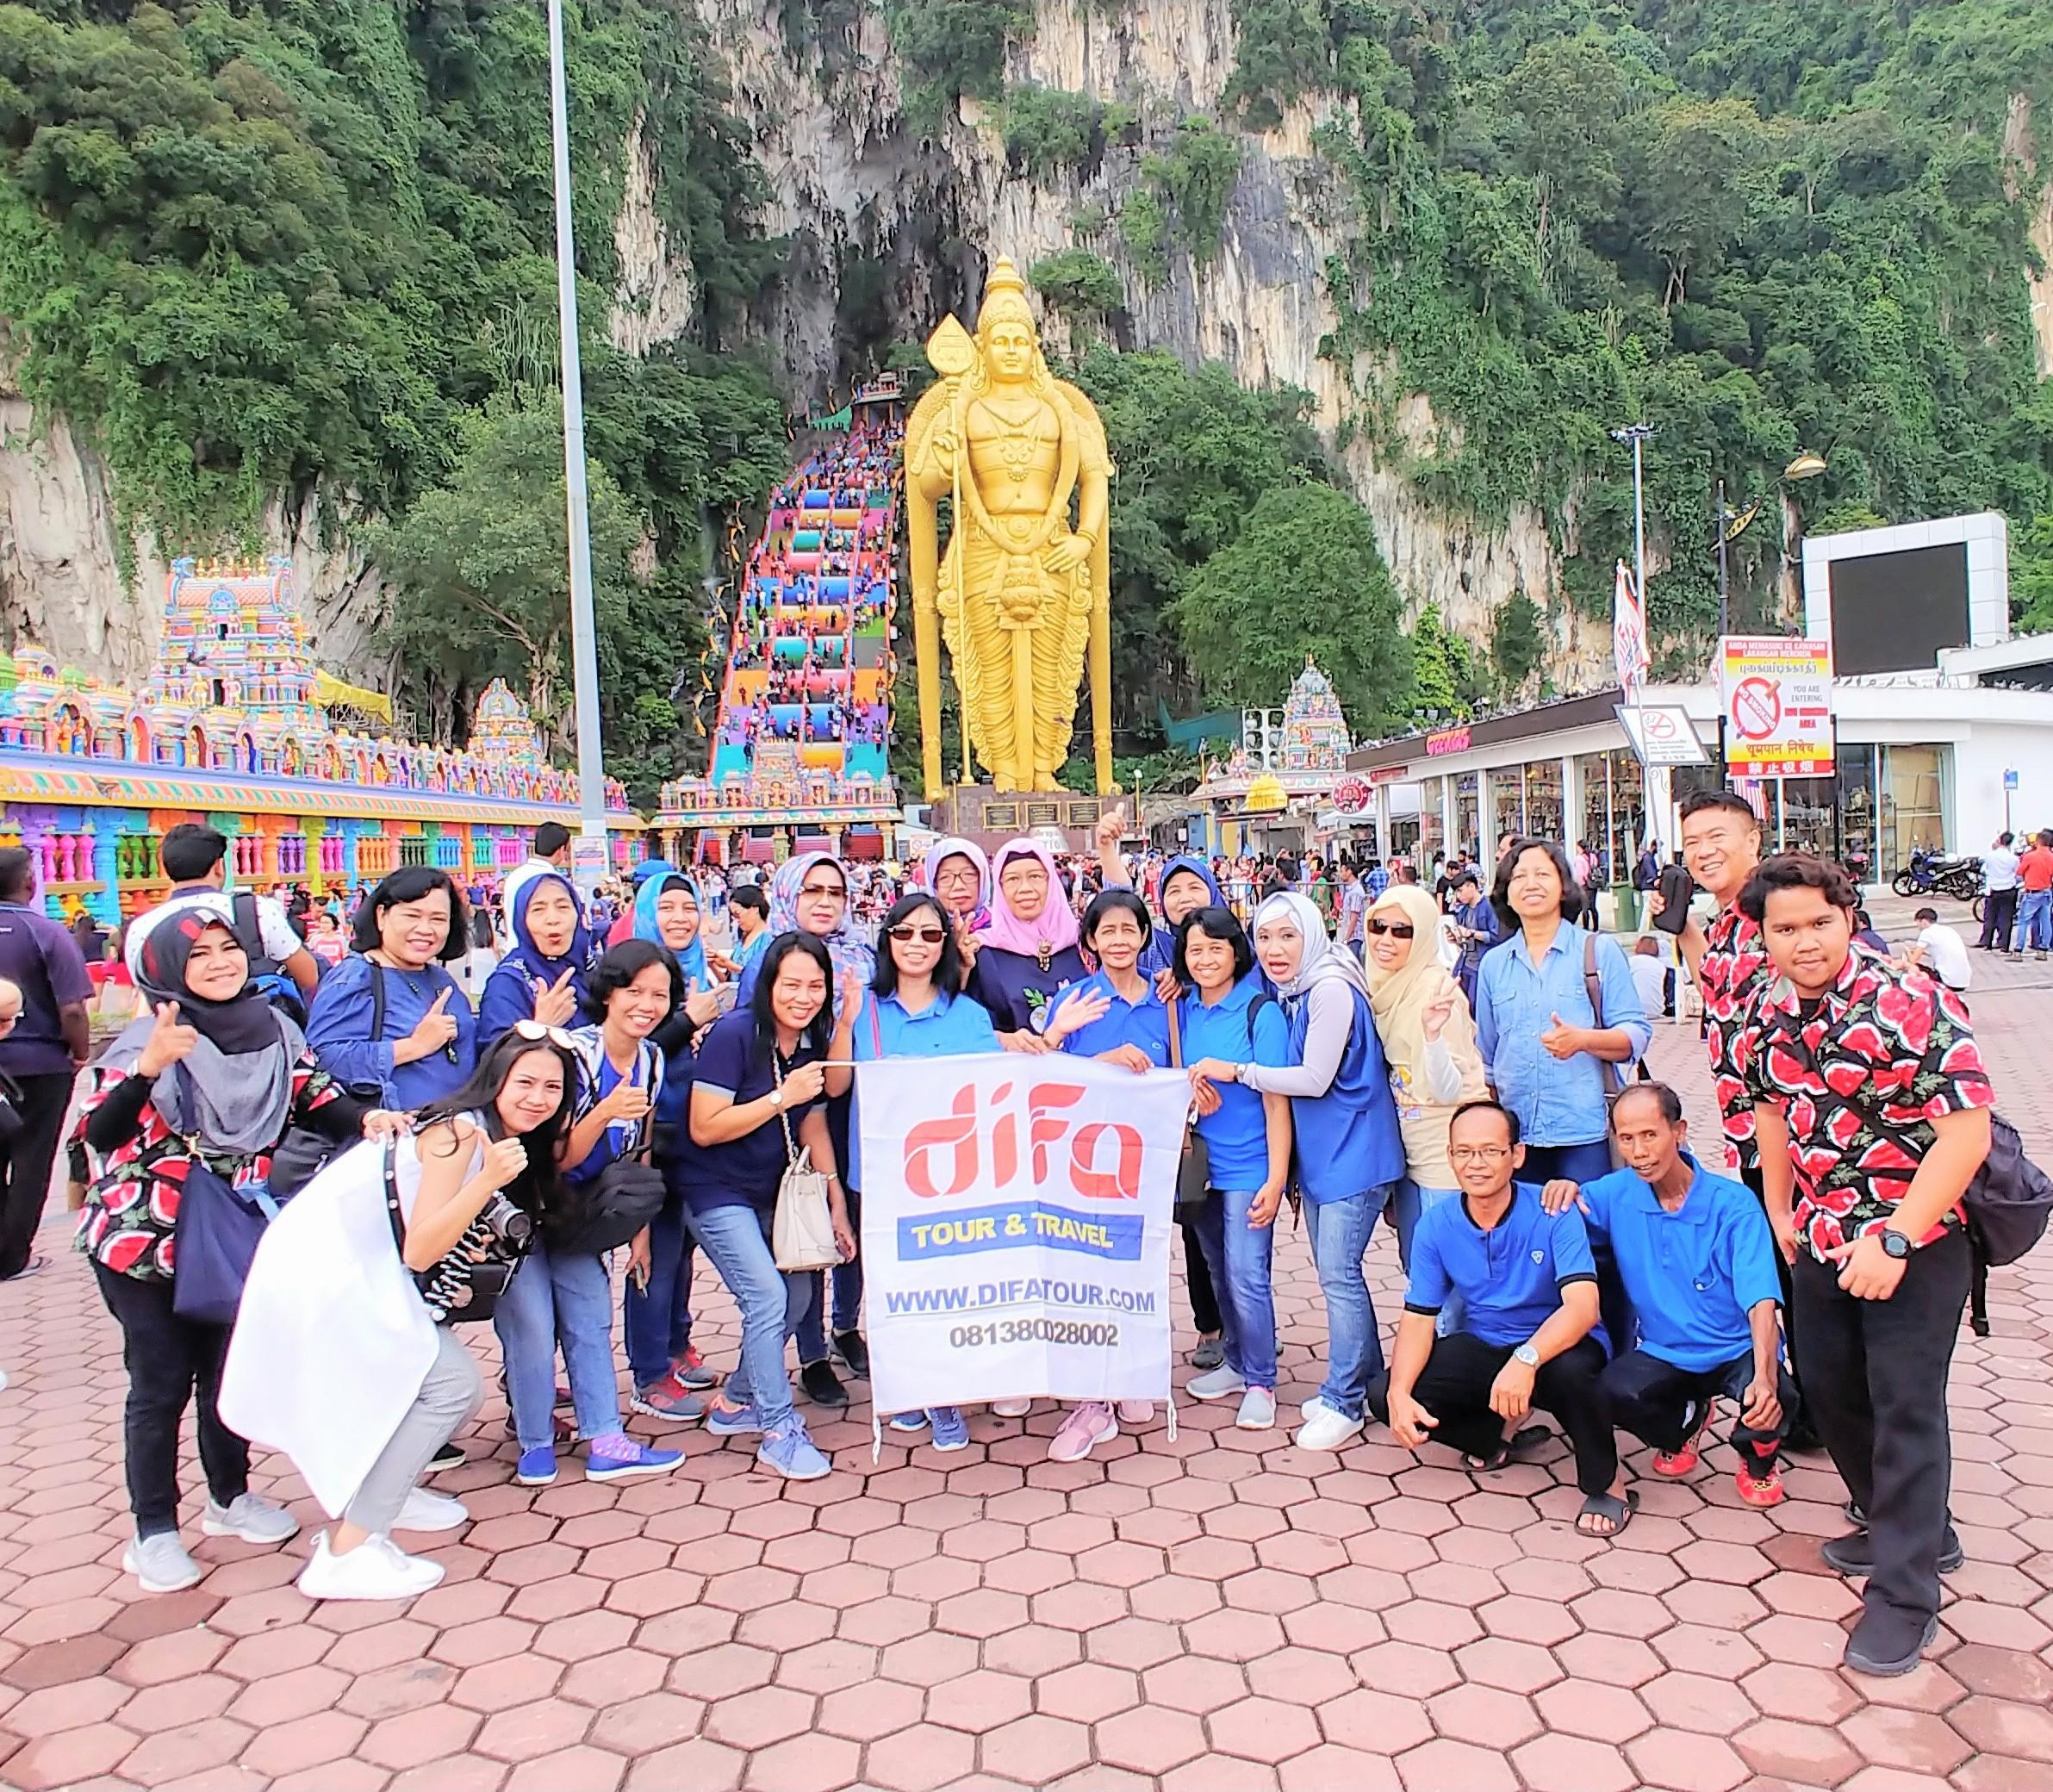 City Tour Kuala Lumpur, Batu Caves